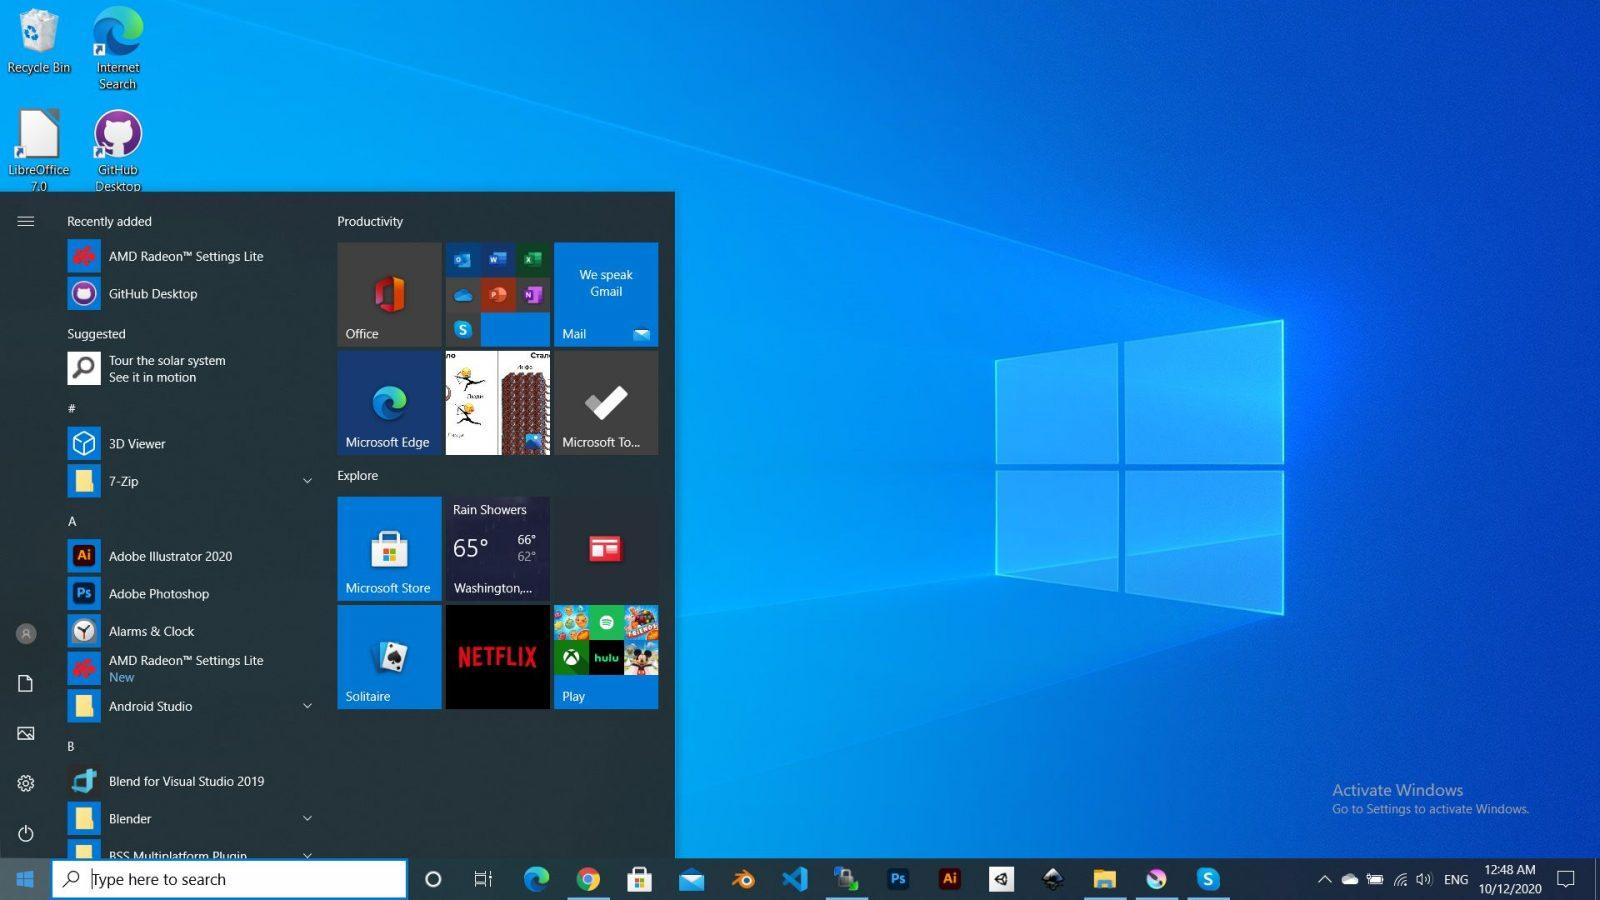 Windows 10 desktop